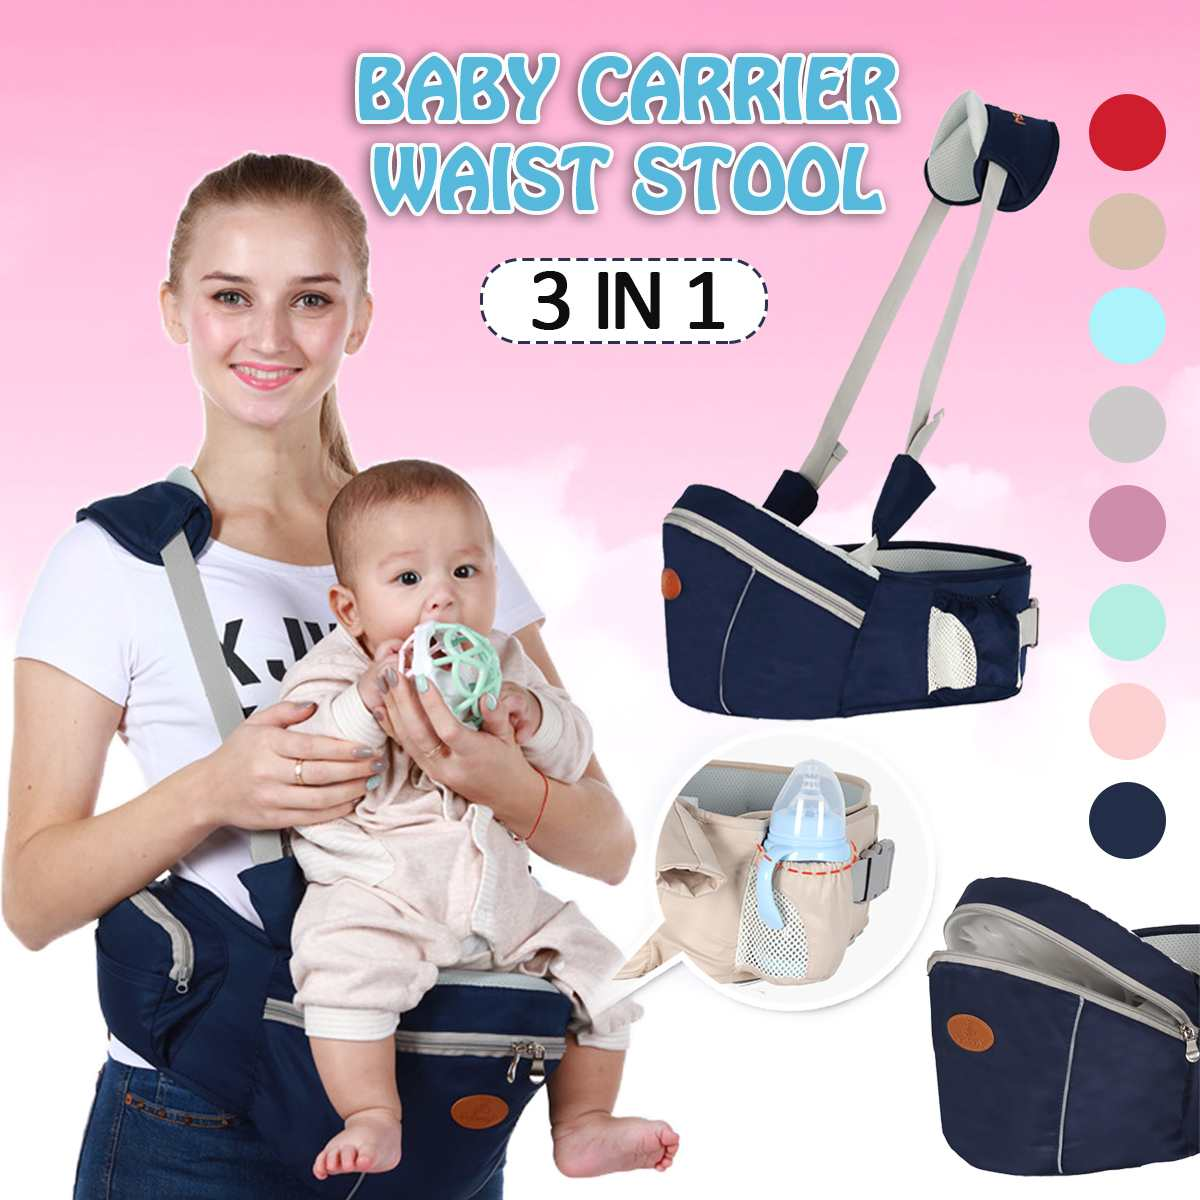 Breathable Baby Carrier Hipseat 0-36 Months Baby Sling Waist Stool Walkers Hold Waist Belt Kangaroo Belt Kids Infant Hip Seat